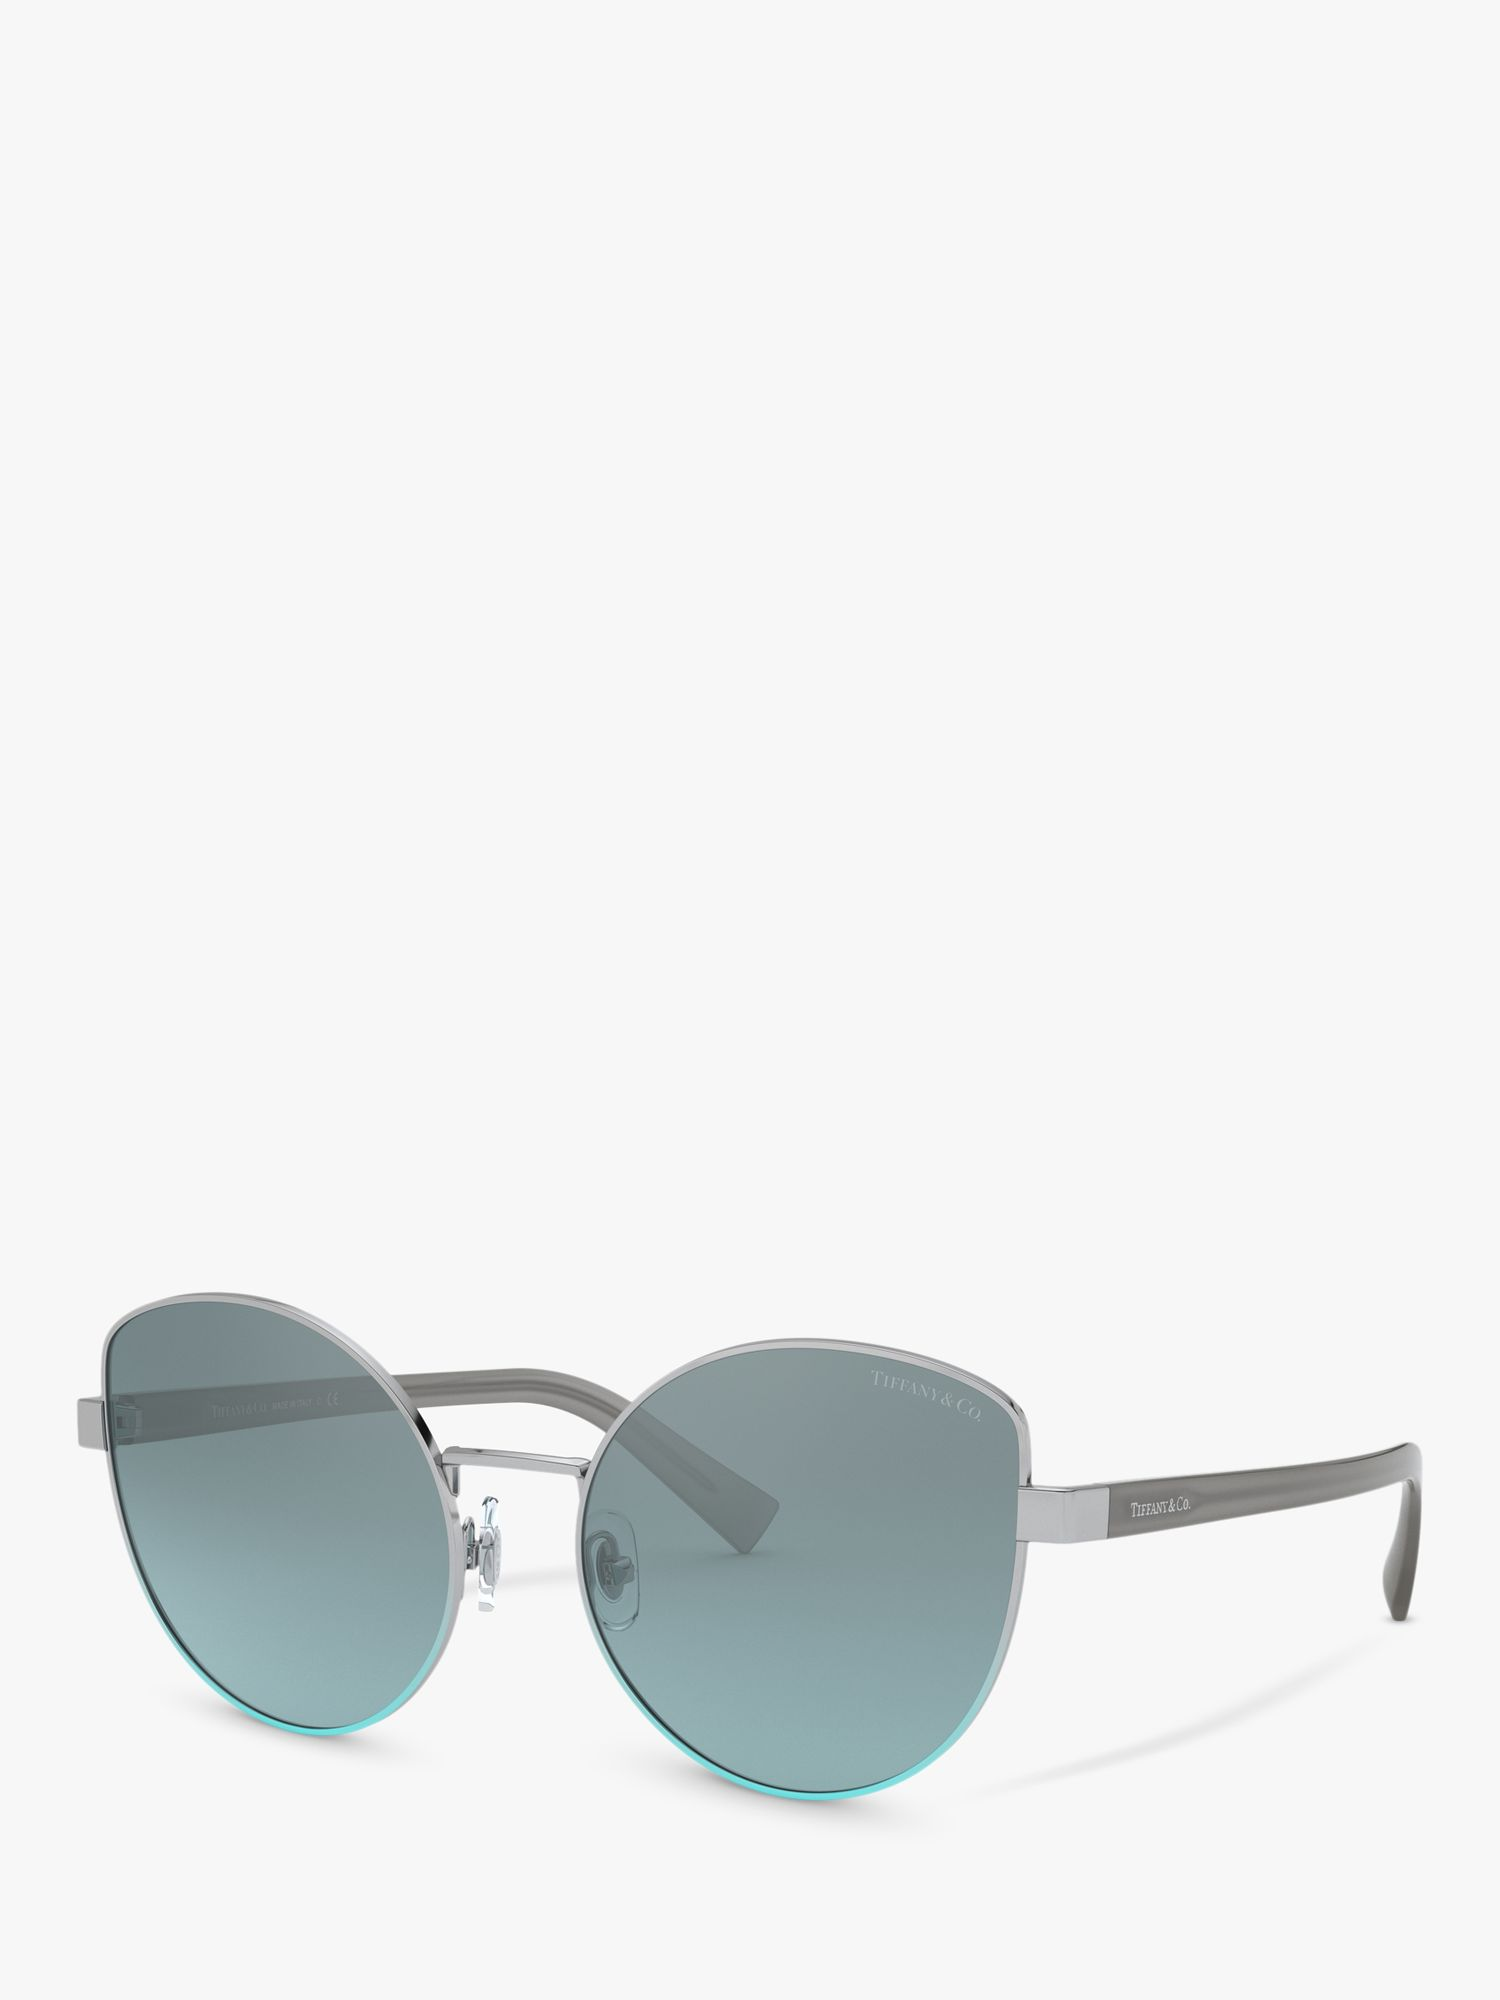 Tiffany & Co Tiffany & Co TF3068 Women's Irregular Sunglasses, Silver/Blue Gradient